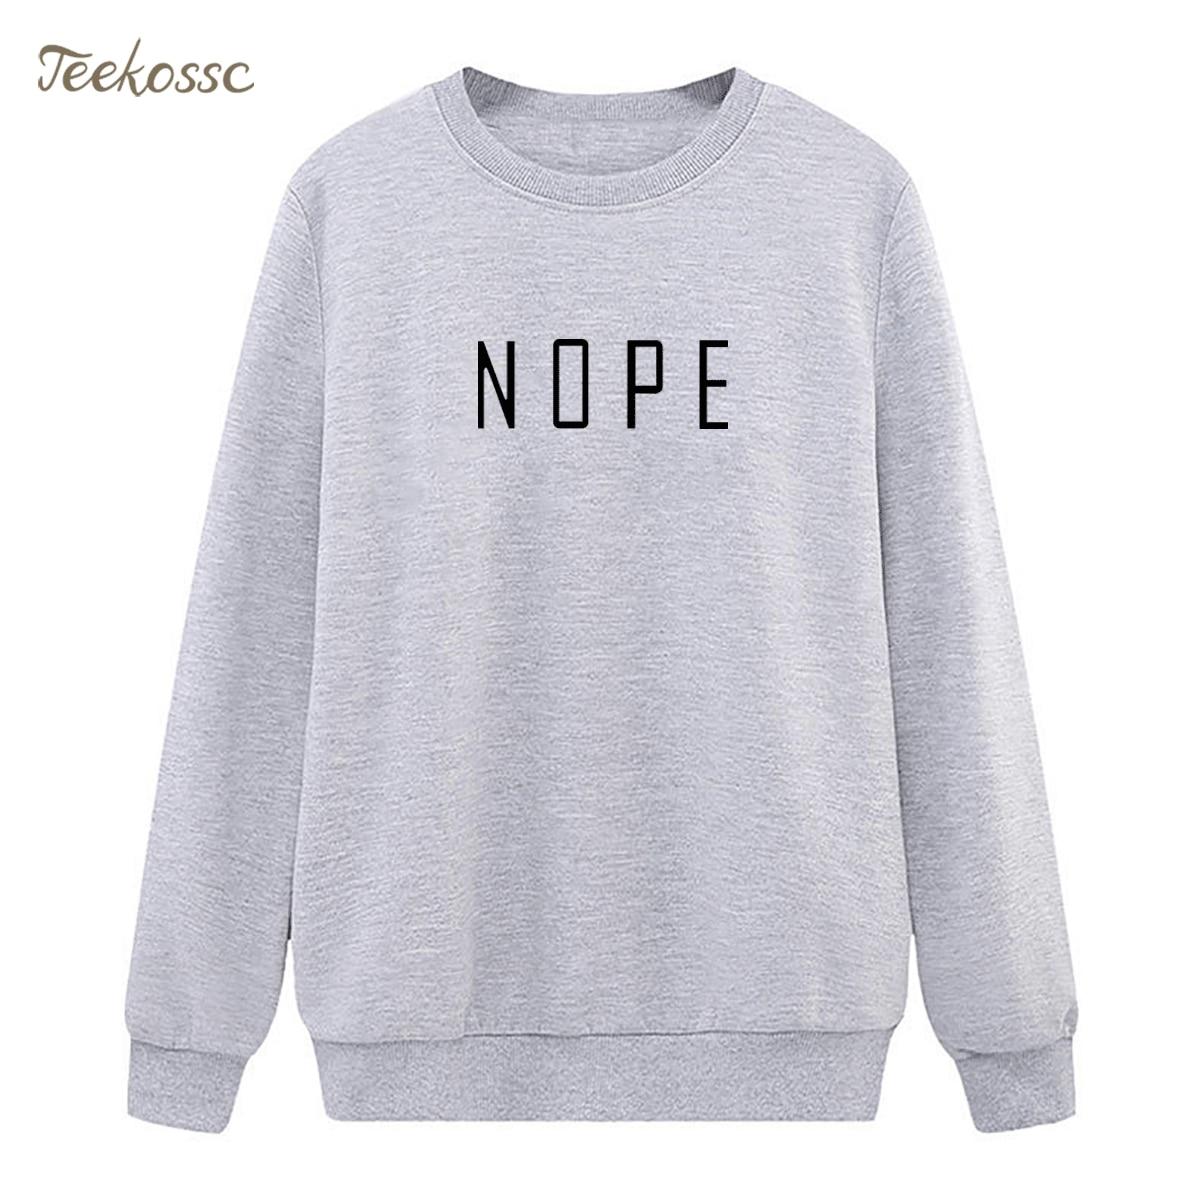 NOPE Sweatshirt Gray Black Hoodie 2018 Hipster Winter Autumn Women Lasdies Pullover Fleece Warm Loose Casual Brand Streetwear